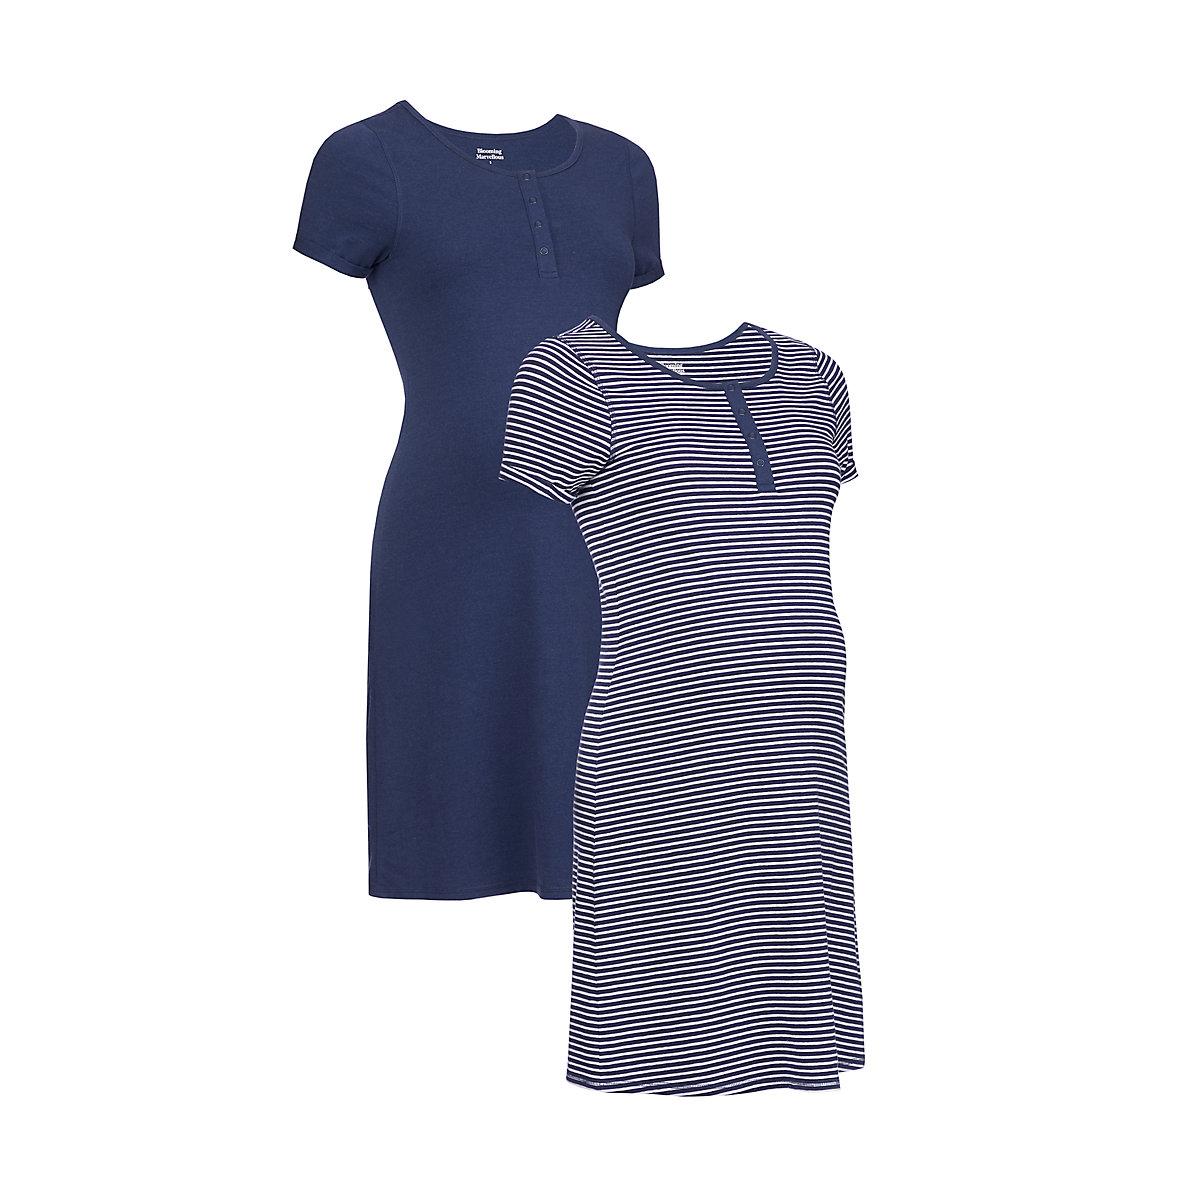 navy stripe and marl nursing nightdresses - 2 pack